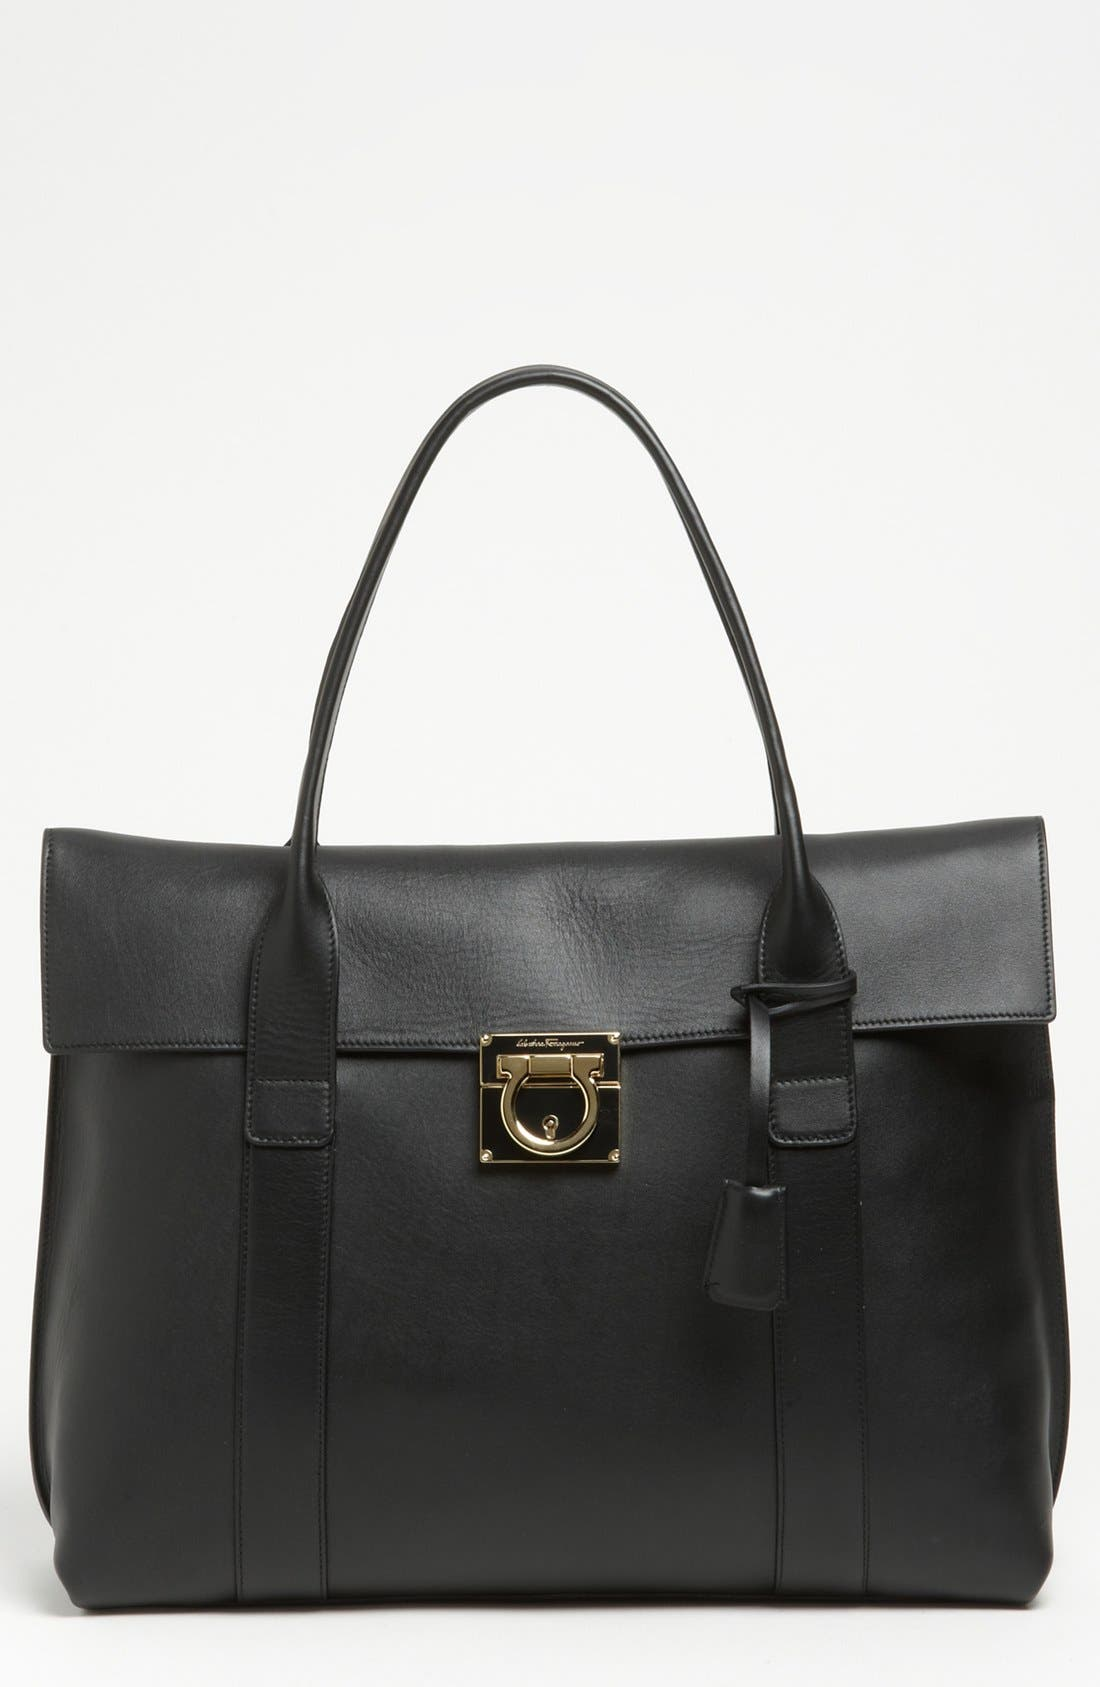 Main Image - Salvatore Ferragamo 'Large Sookie' Leather Shopper